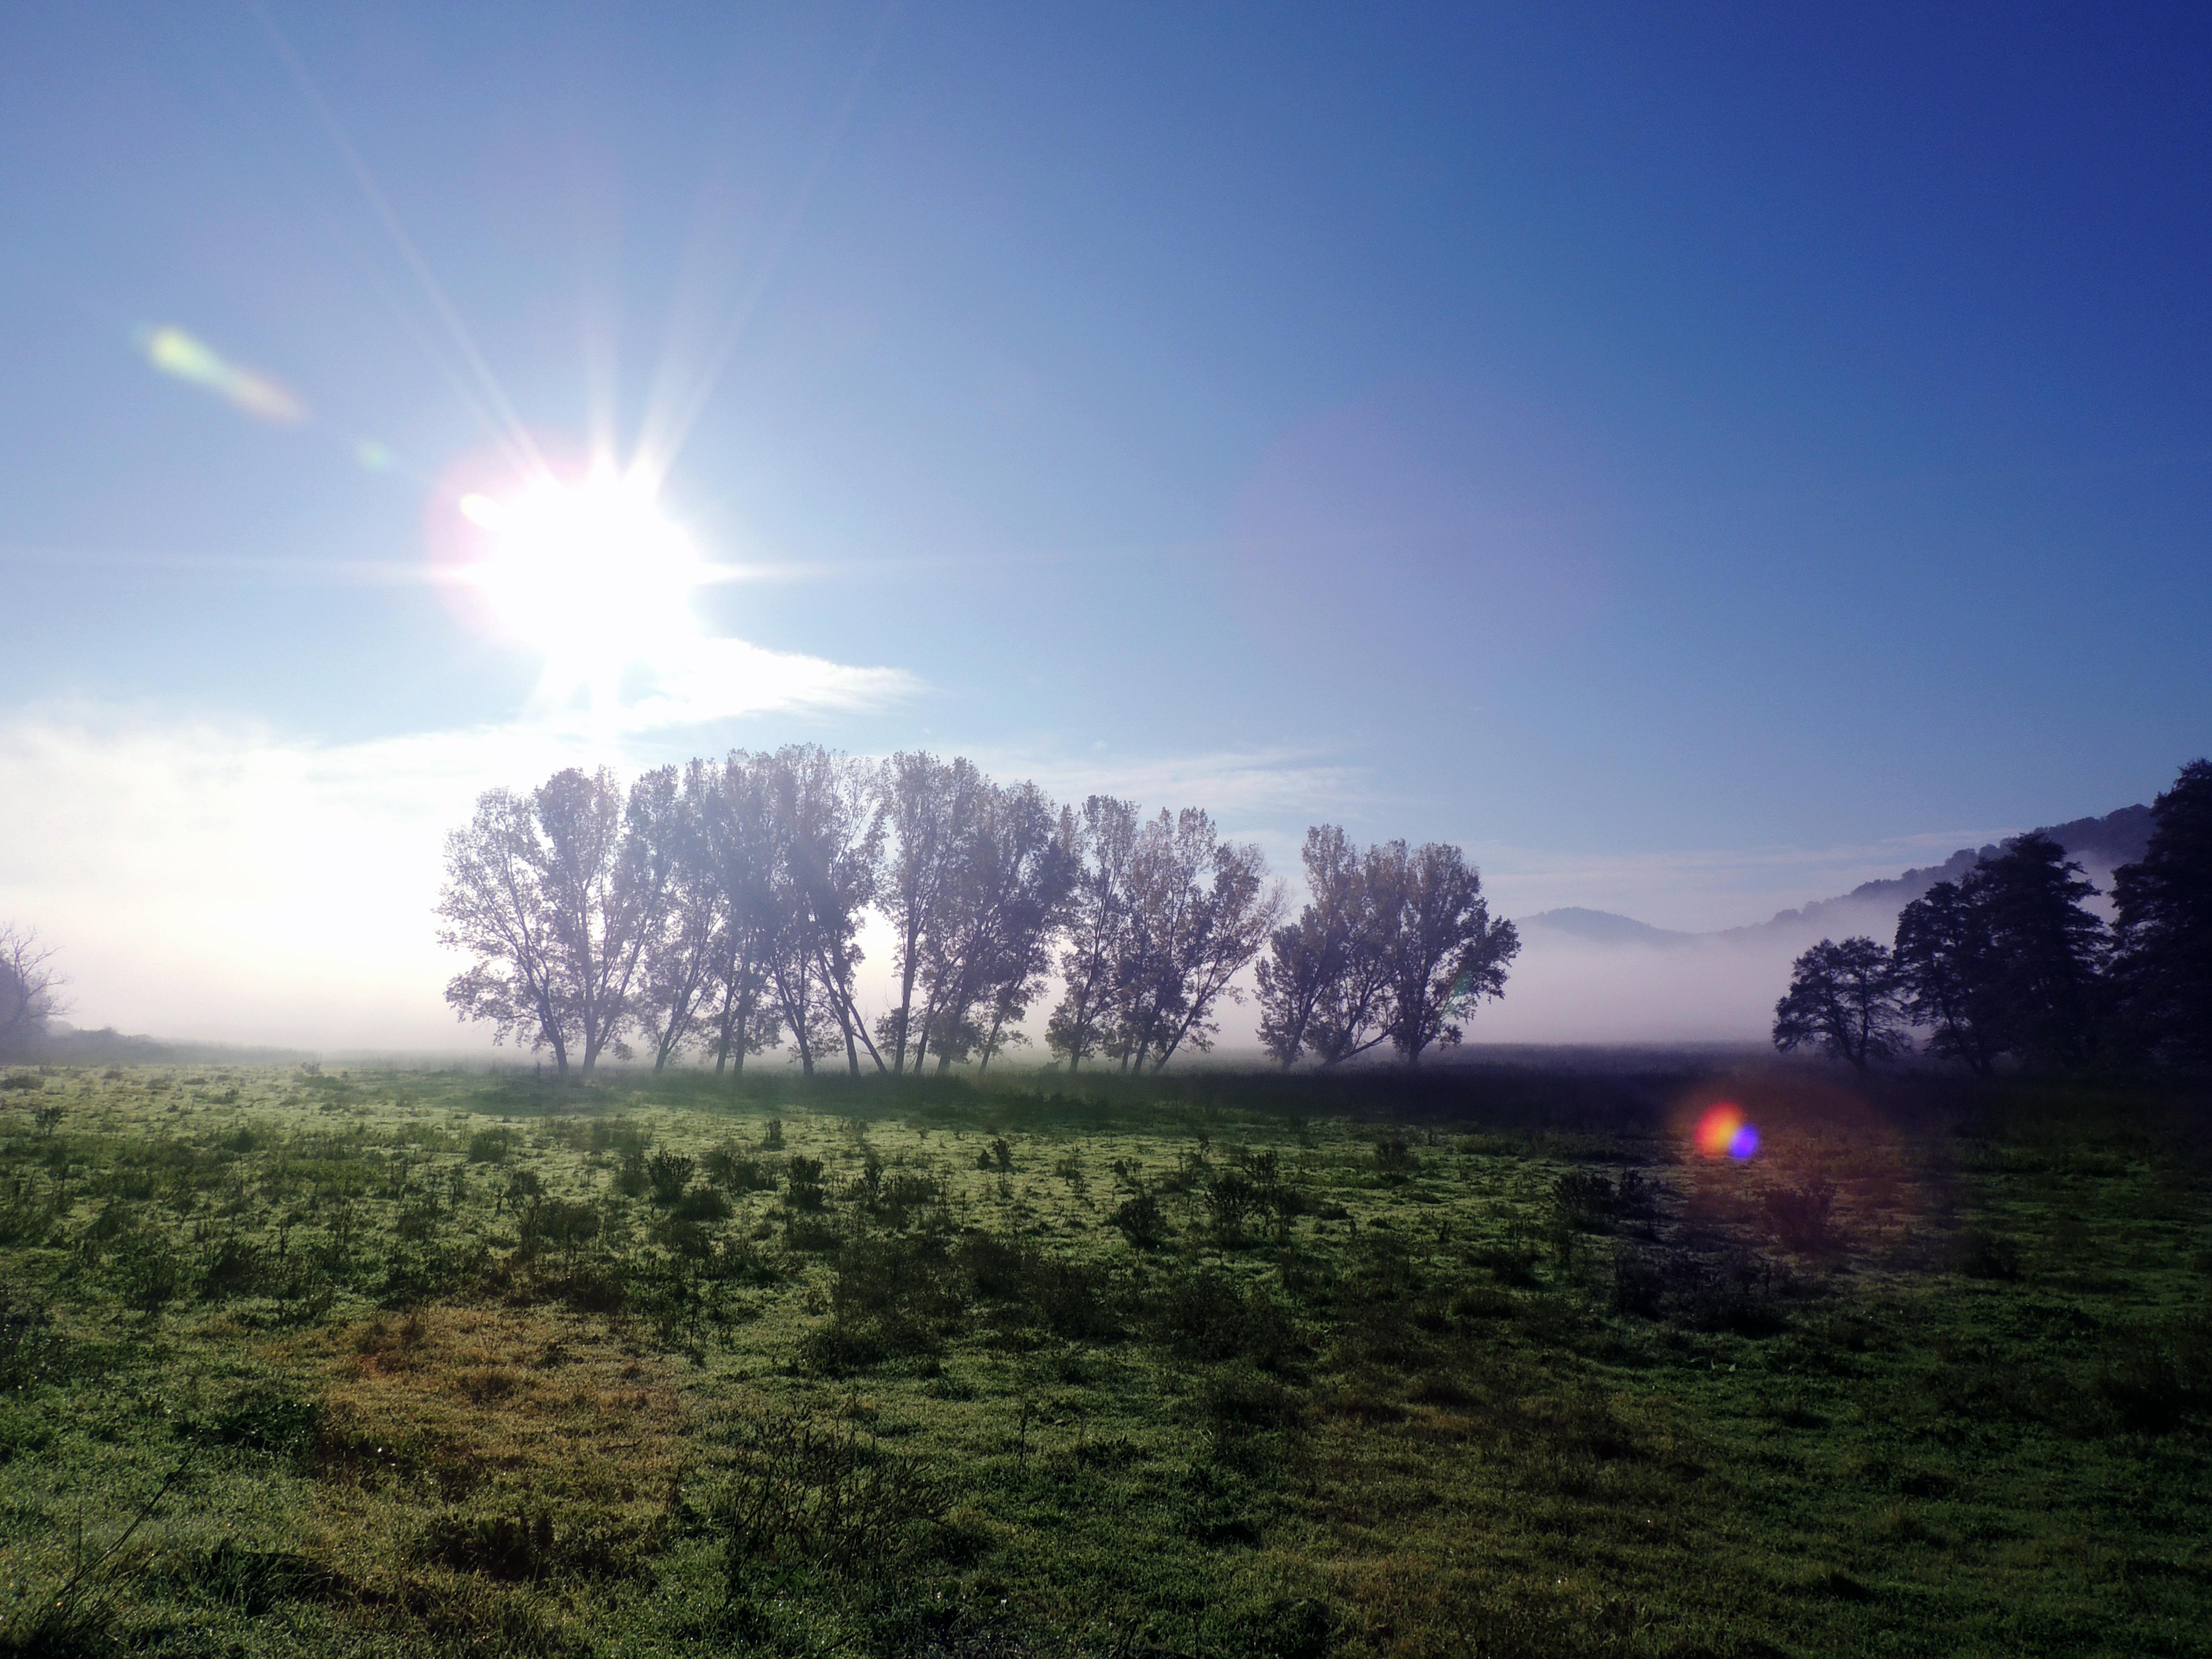 c2b0565f301a4 Free Images : landscape, tree, nature, grass, horizon, light, cloud, sky,  sun, sunrise, sunset, mist, field, meadow, sunlight, morning, hill, dawn,  ...